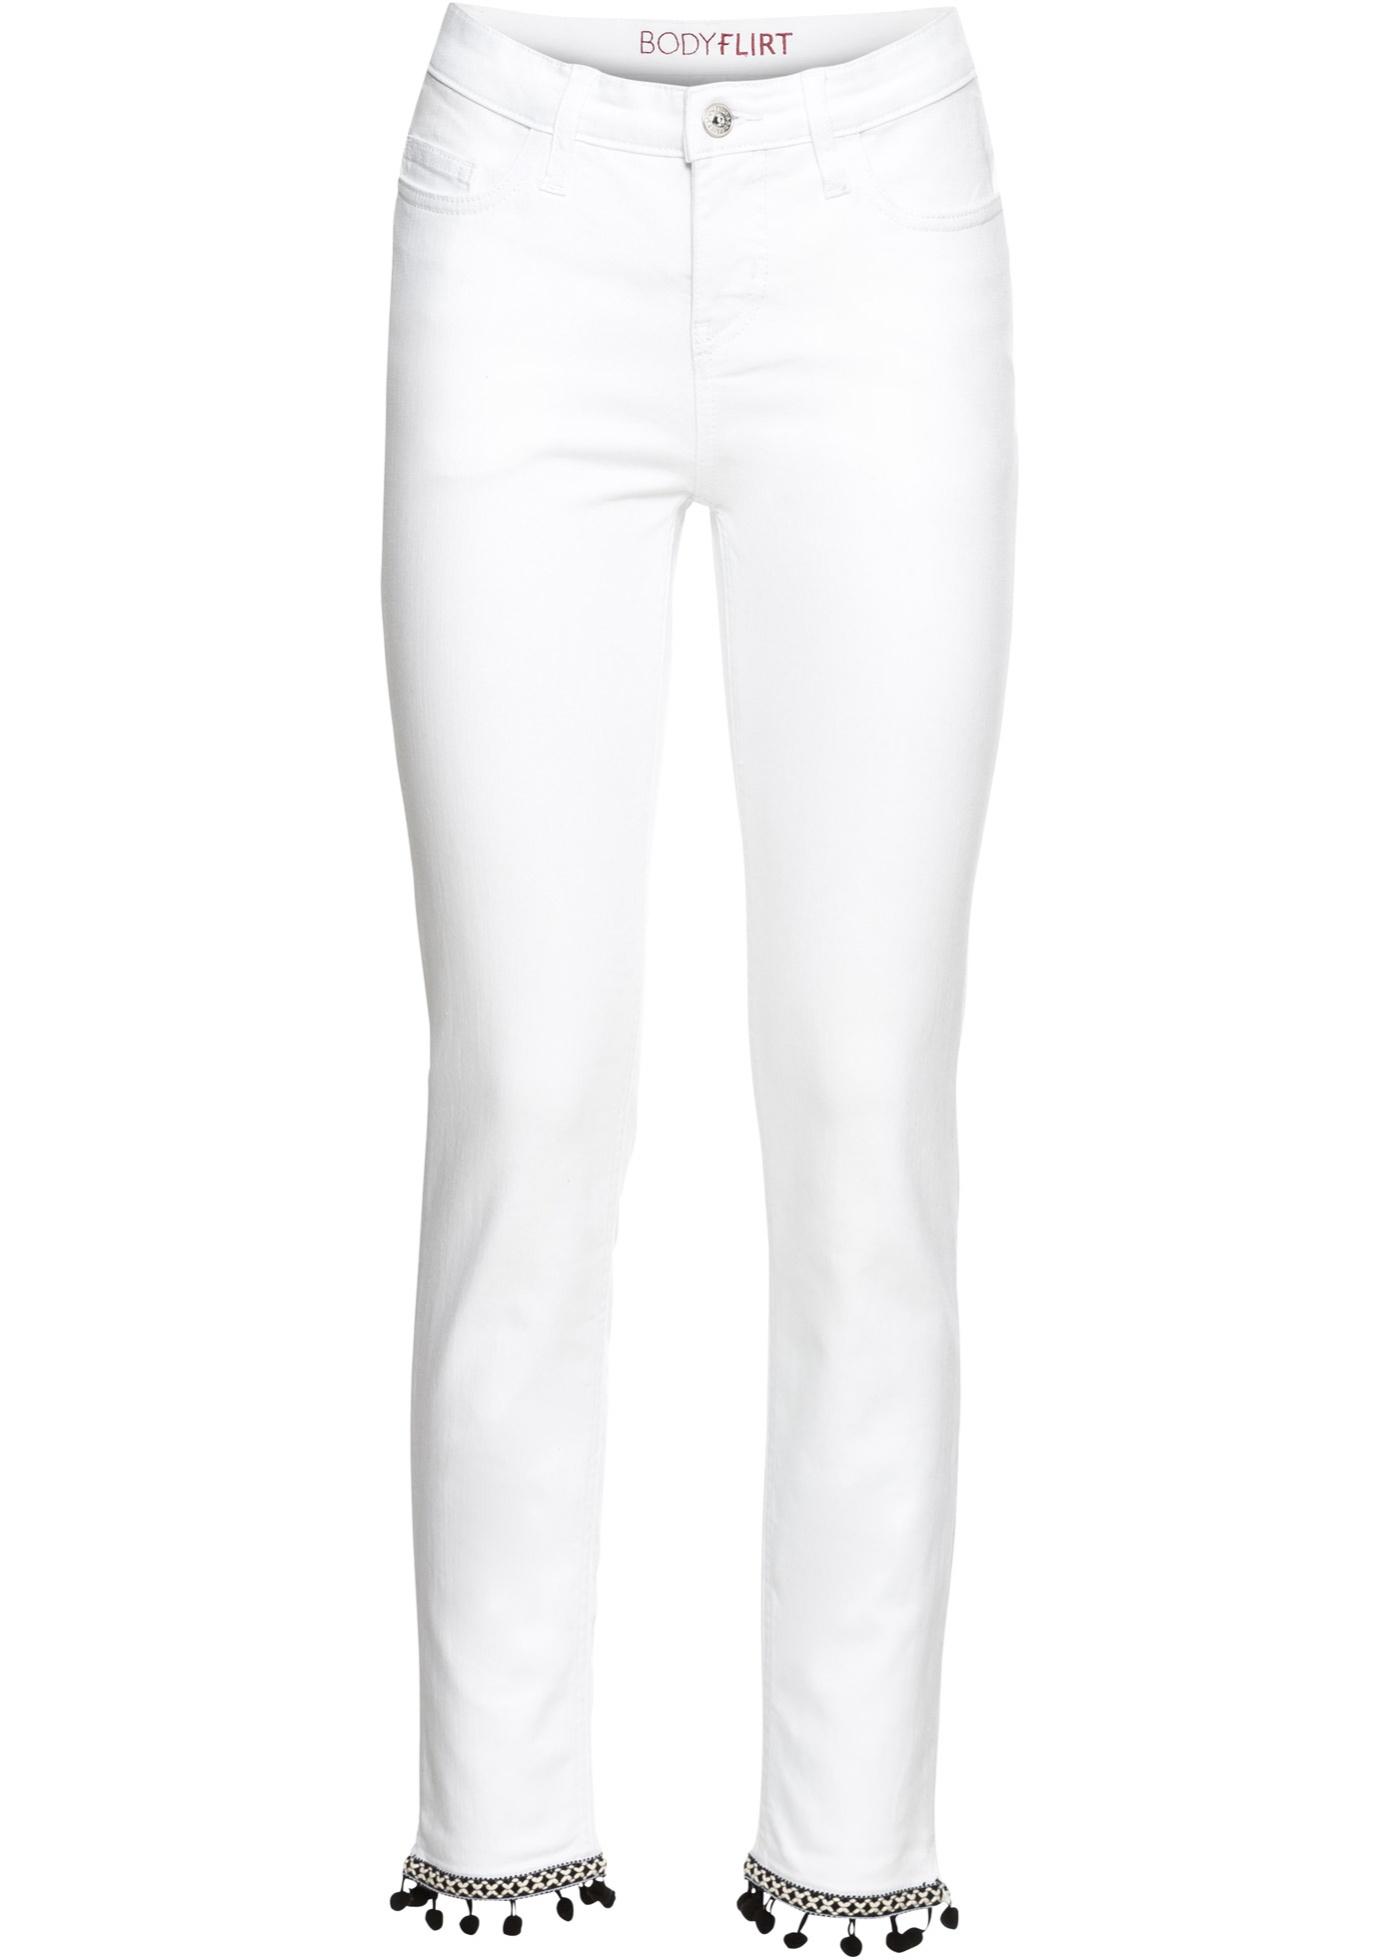 À BonprixJean Pompons Bodyflirt Femme Blanc Pour 7y6gbf